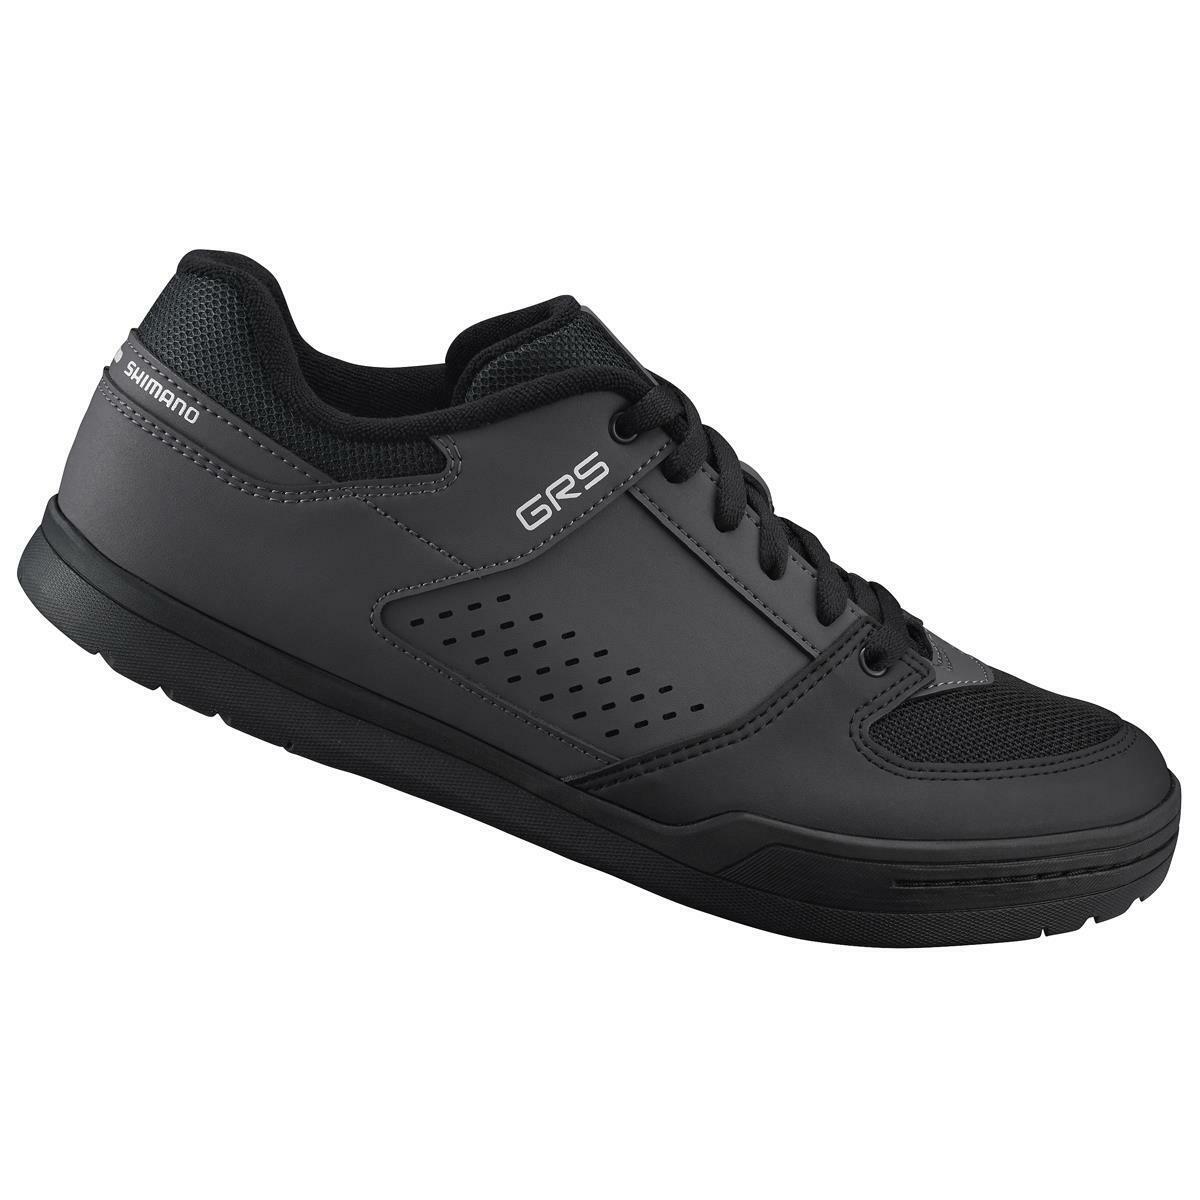 Flat shoes mtb SH-GR500SG1 GR500 grey 2019 SHIMANO cycling shoes